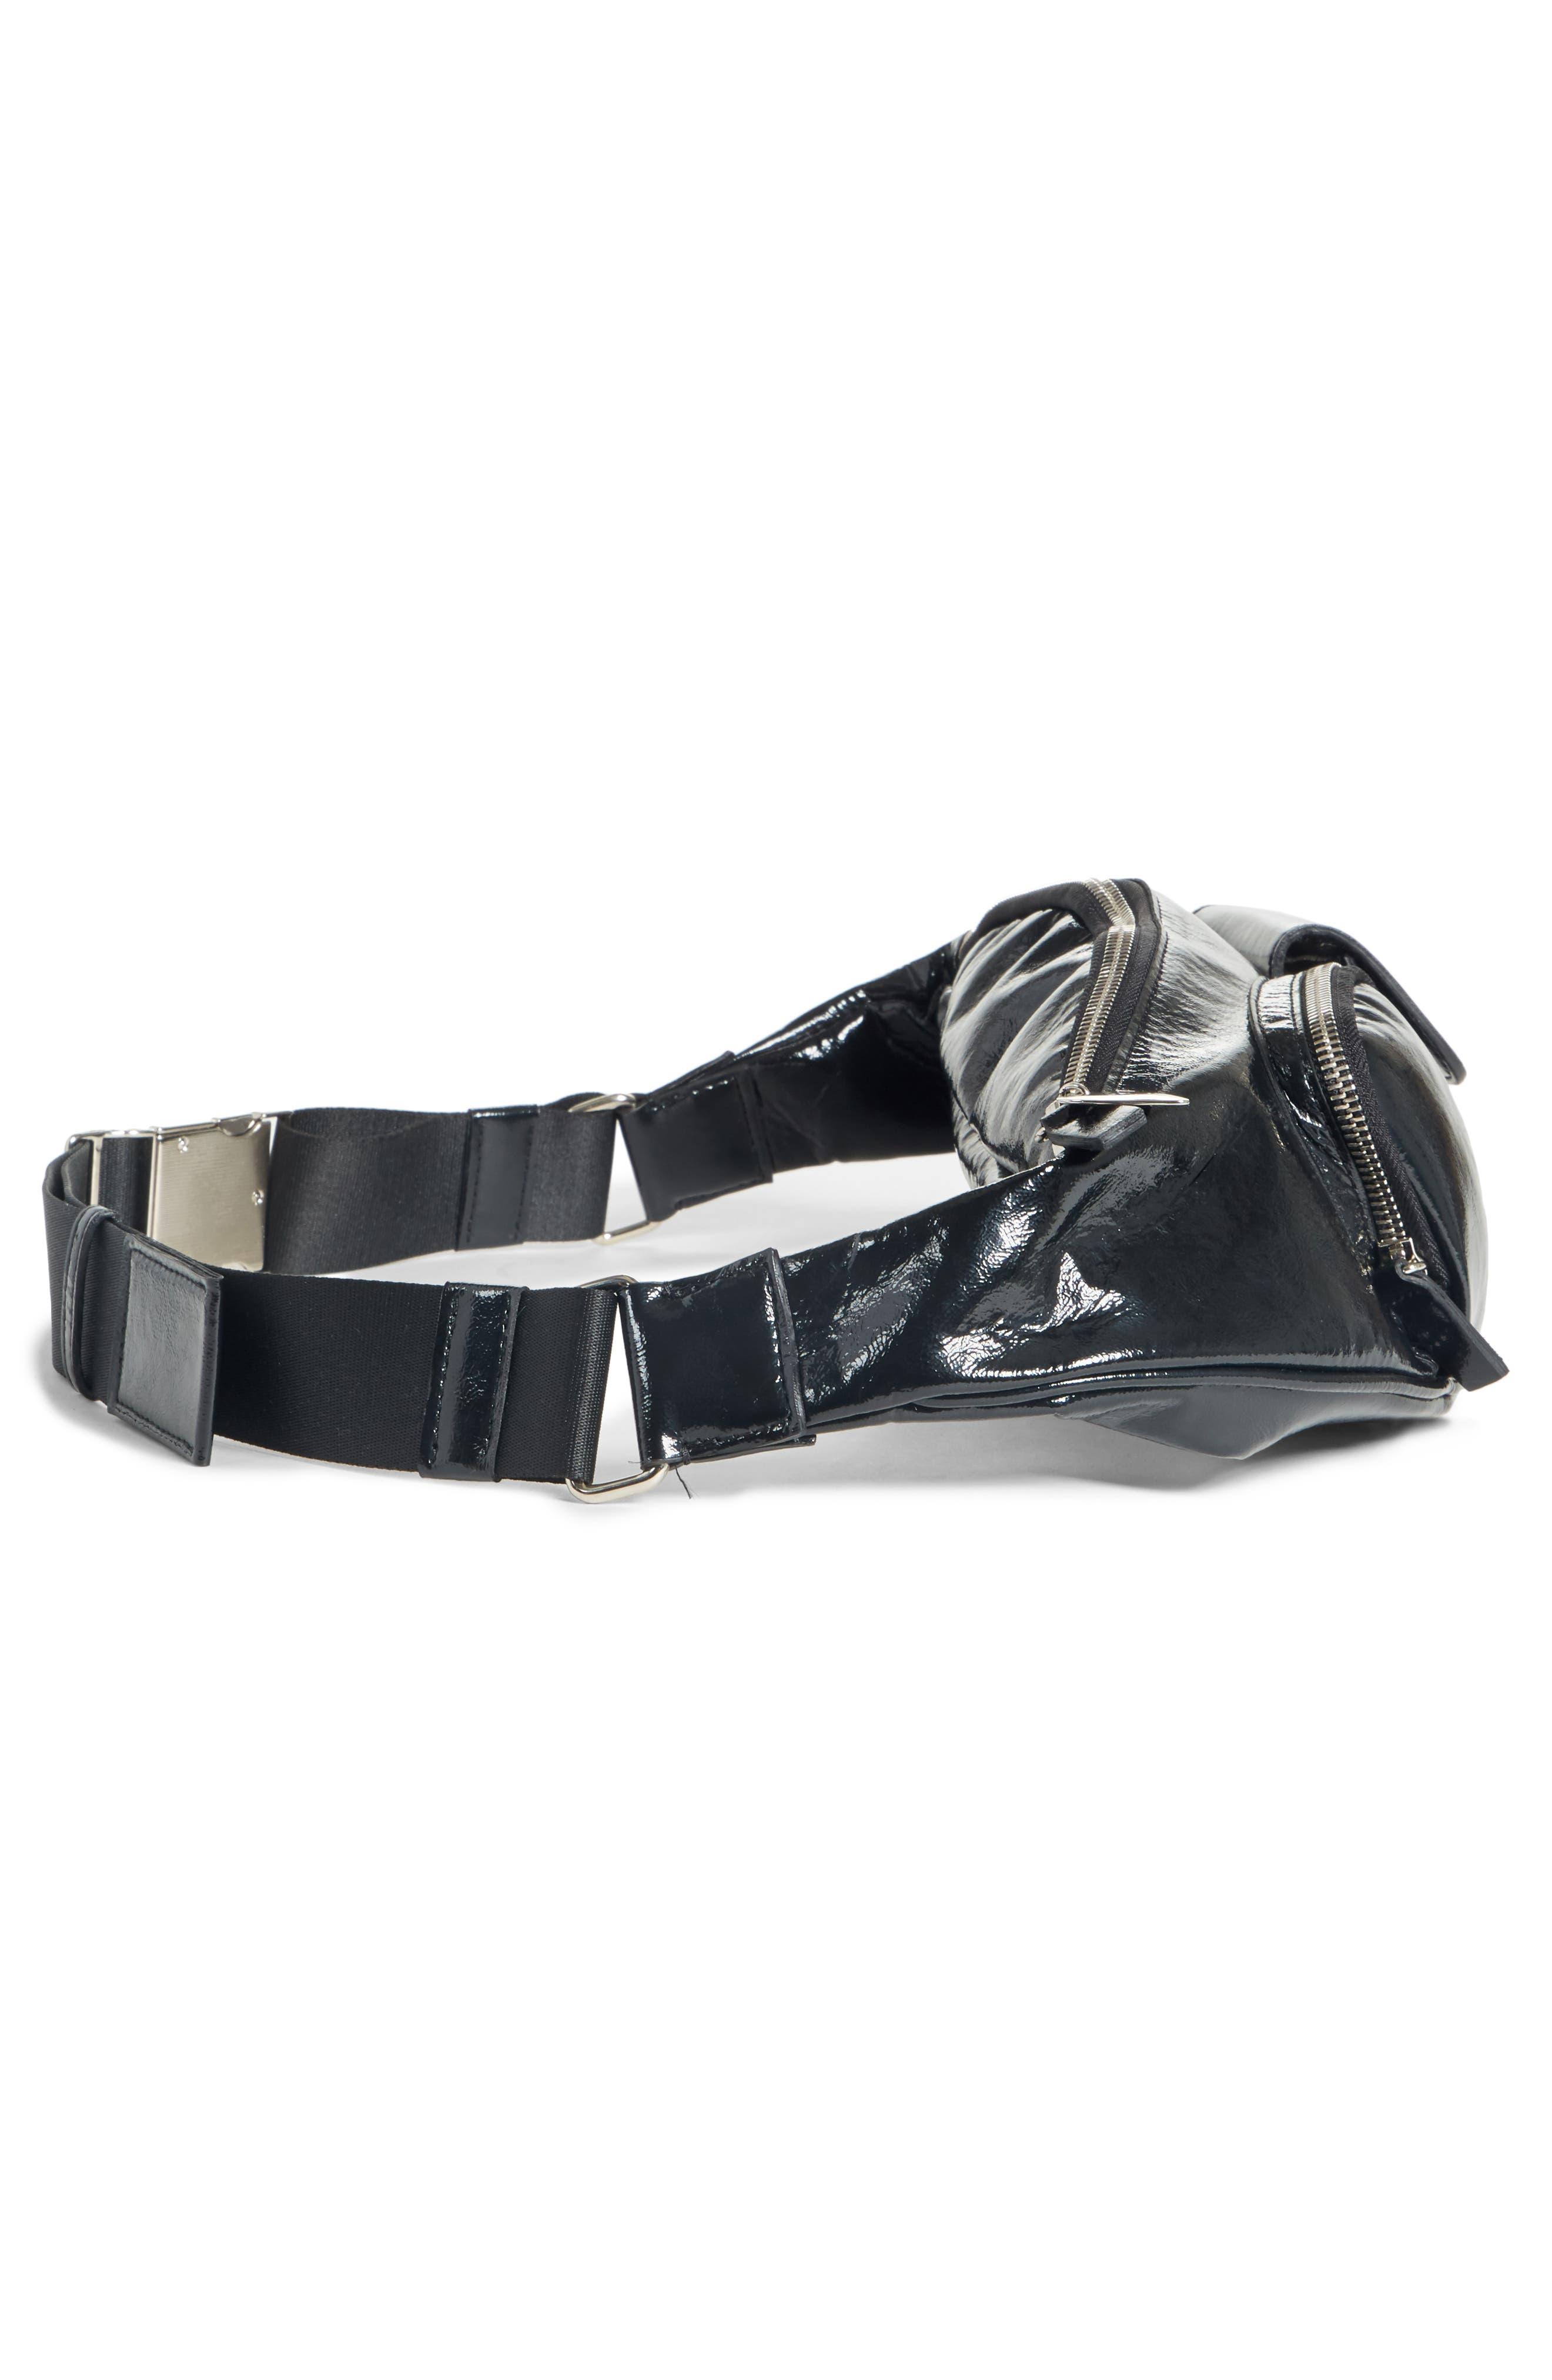 Major Convertible Belt Bag,                             Alternate thumbnail 5, color,                             BLACK PATENT